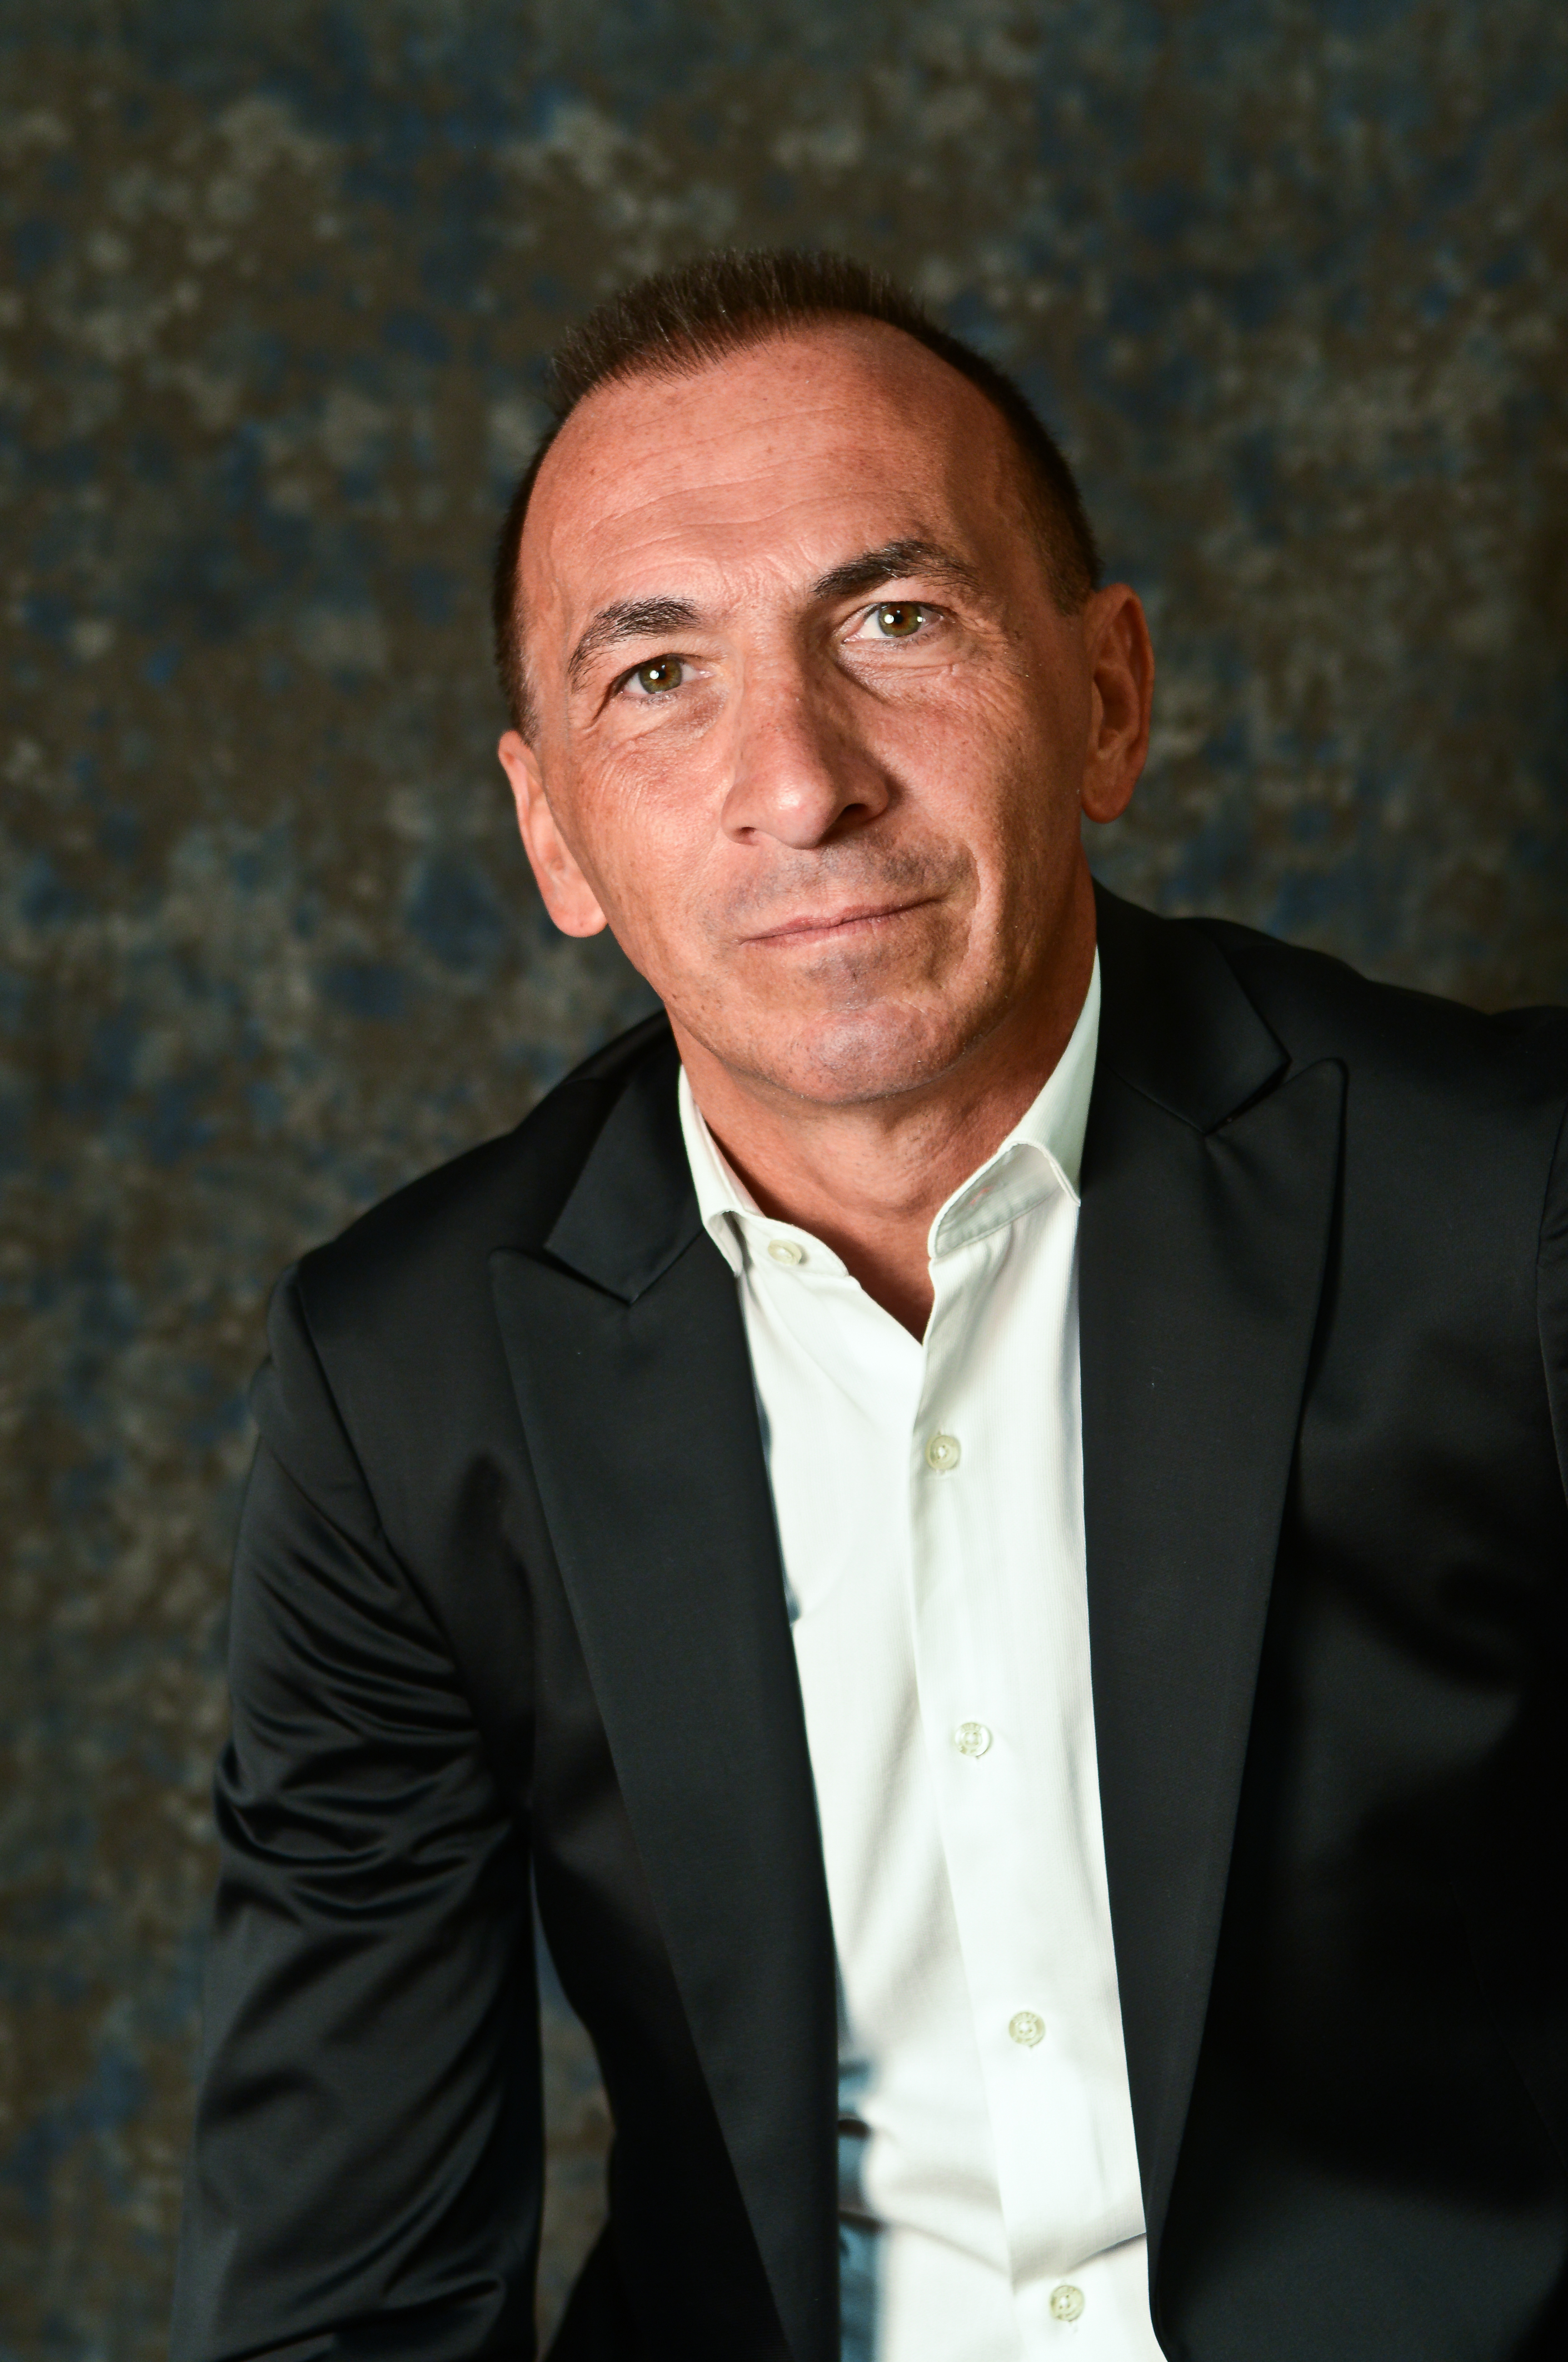 Prof. PAPARELLA Antonello